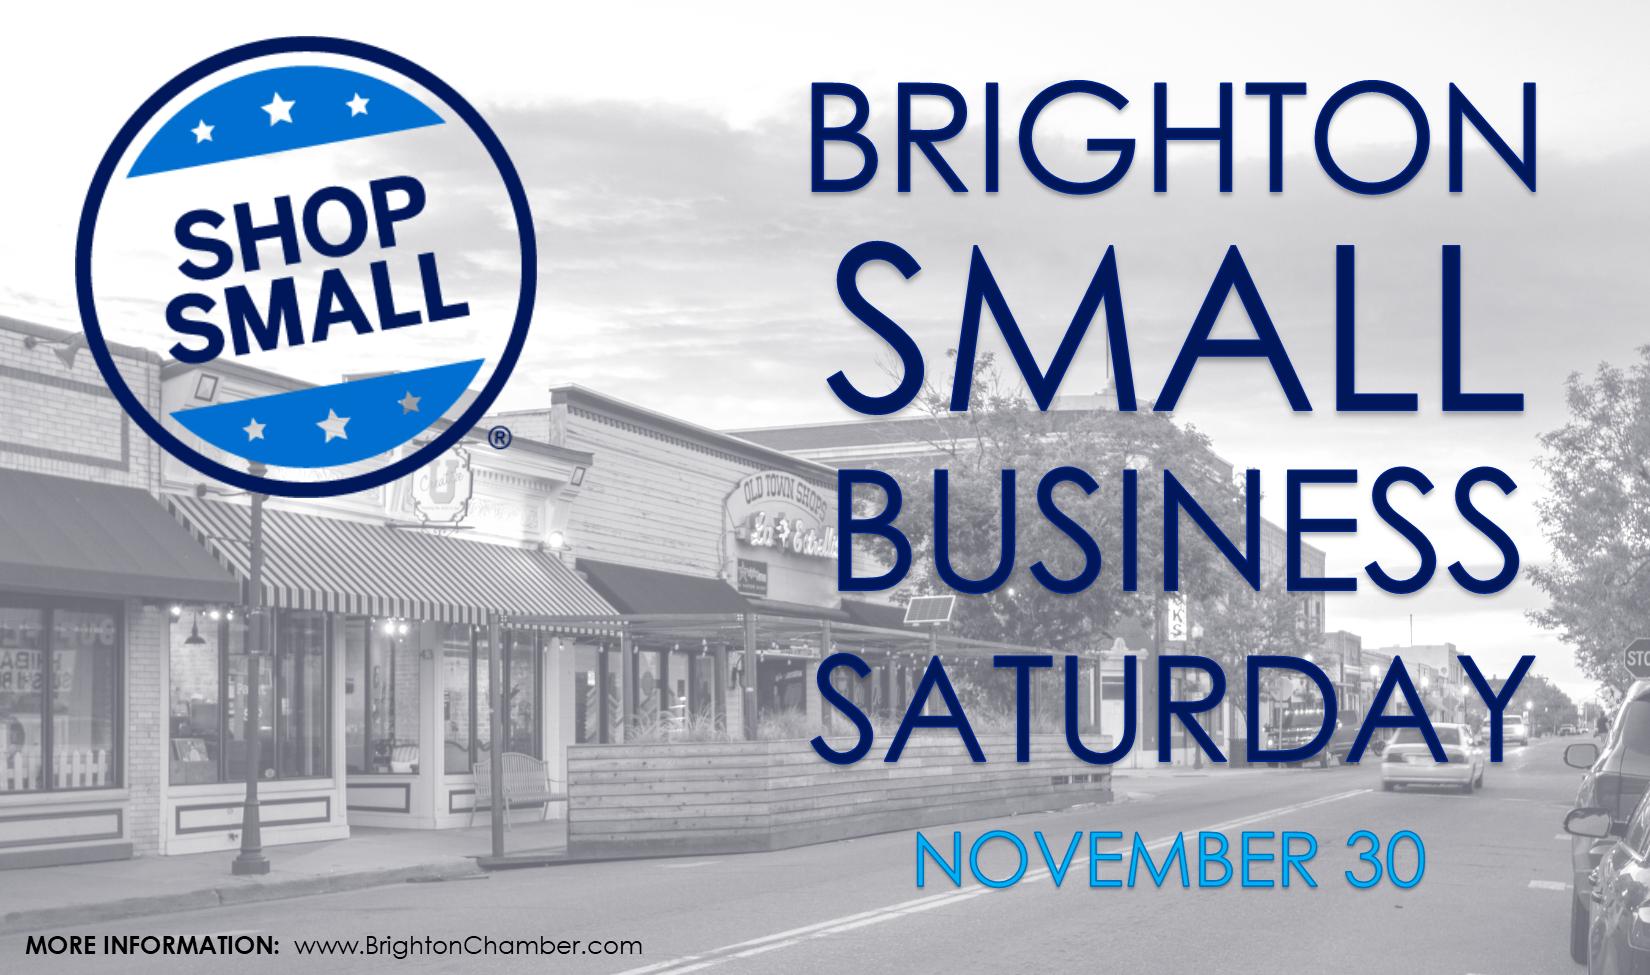 Small-Business-Saturday-Nov-30-2019.pub.png